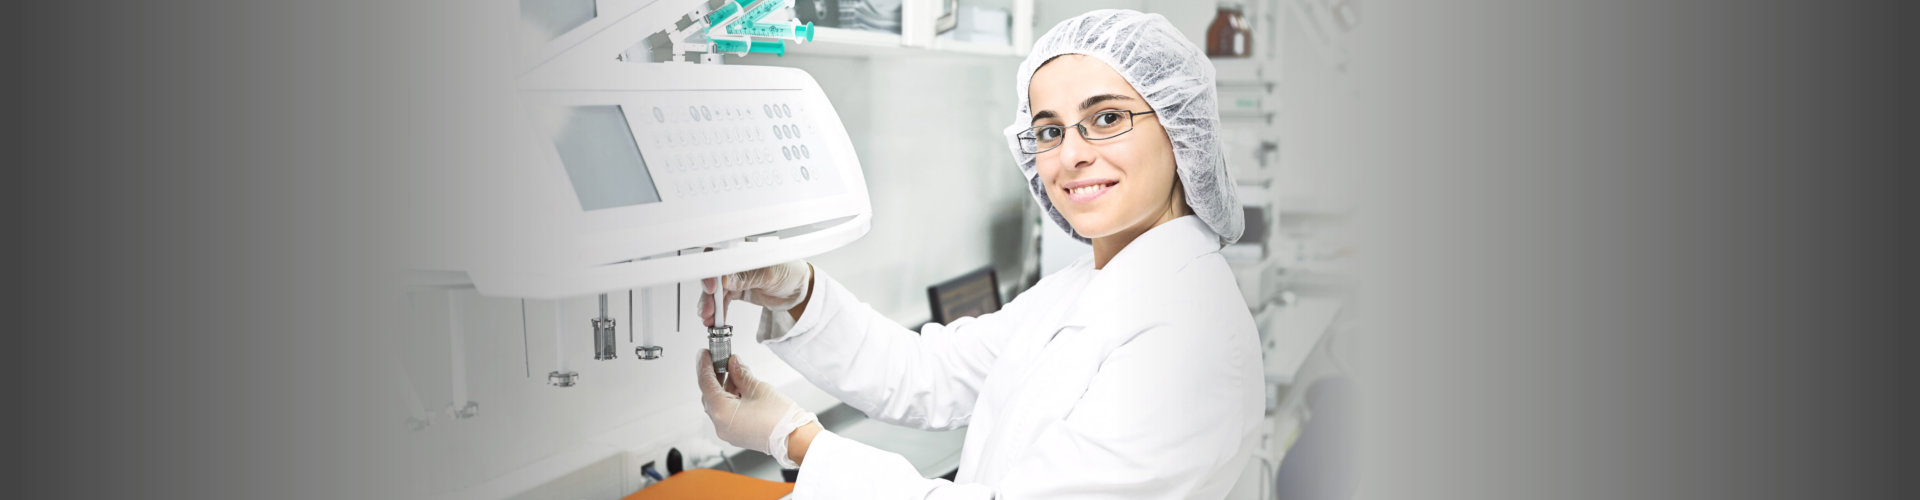 chemist smiling